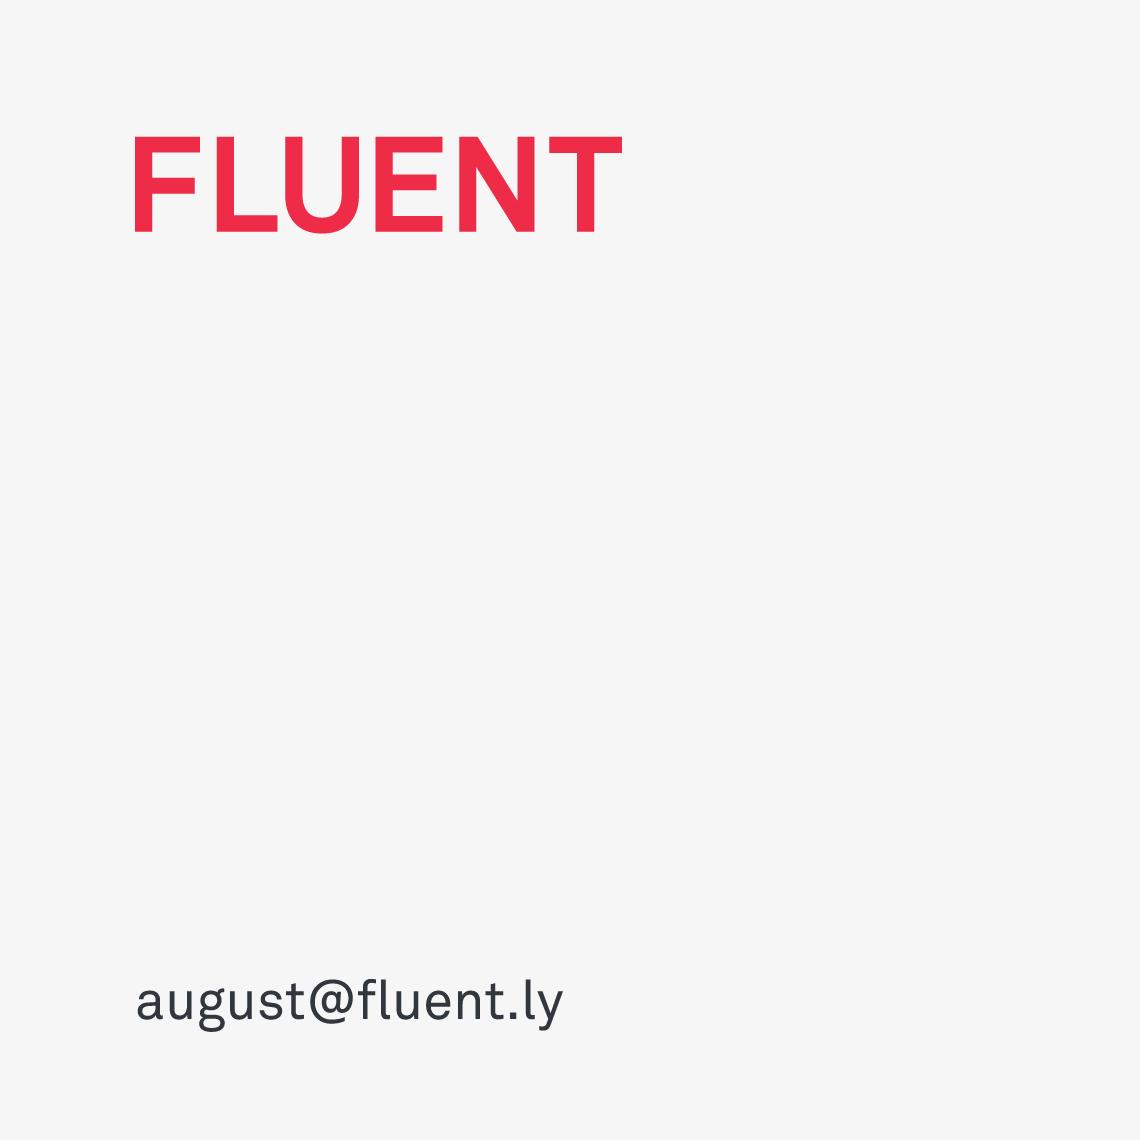 rayko_fluent_card_01